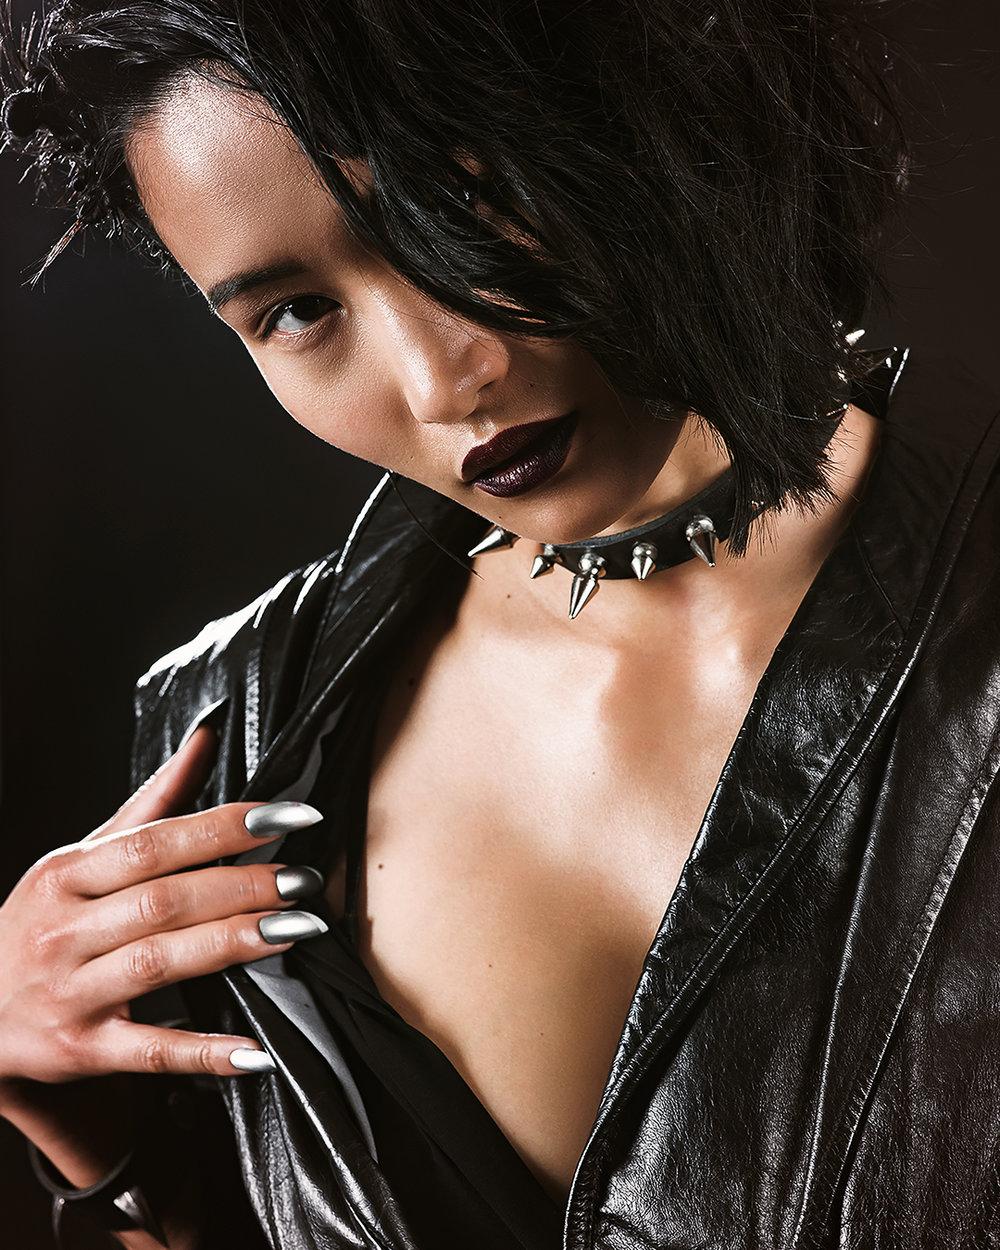 Photographer - Todd Allen / Styling - Jazmine Ransom / Wardrobe - Zuri Ngilibus / Hair - Stephanie James / MUA - Amy Galibut / Nails - Hemi Park / Model - Miki Hamino